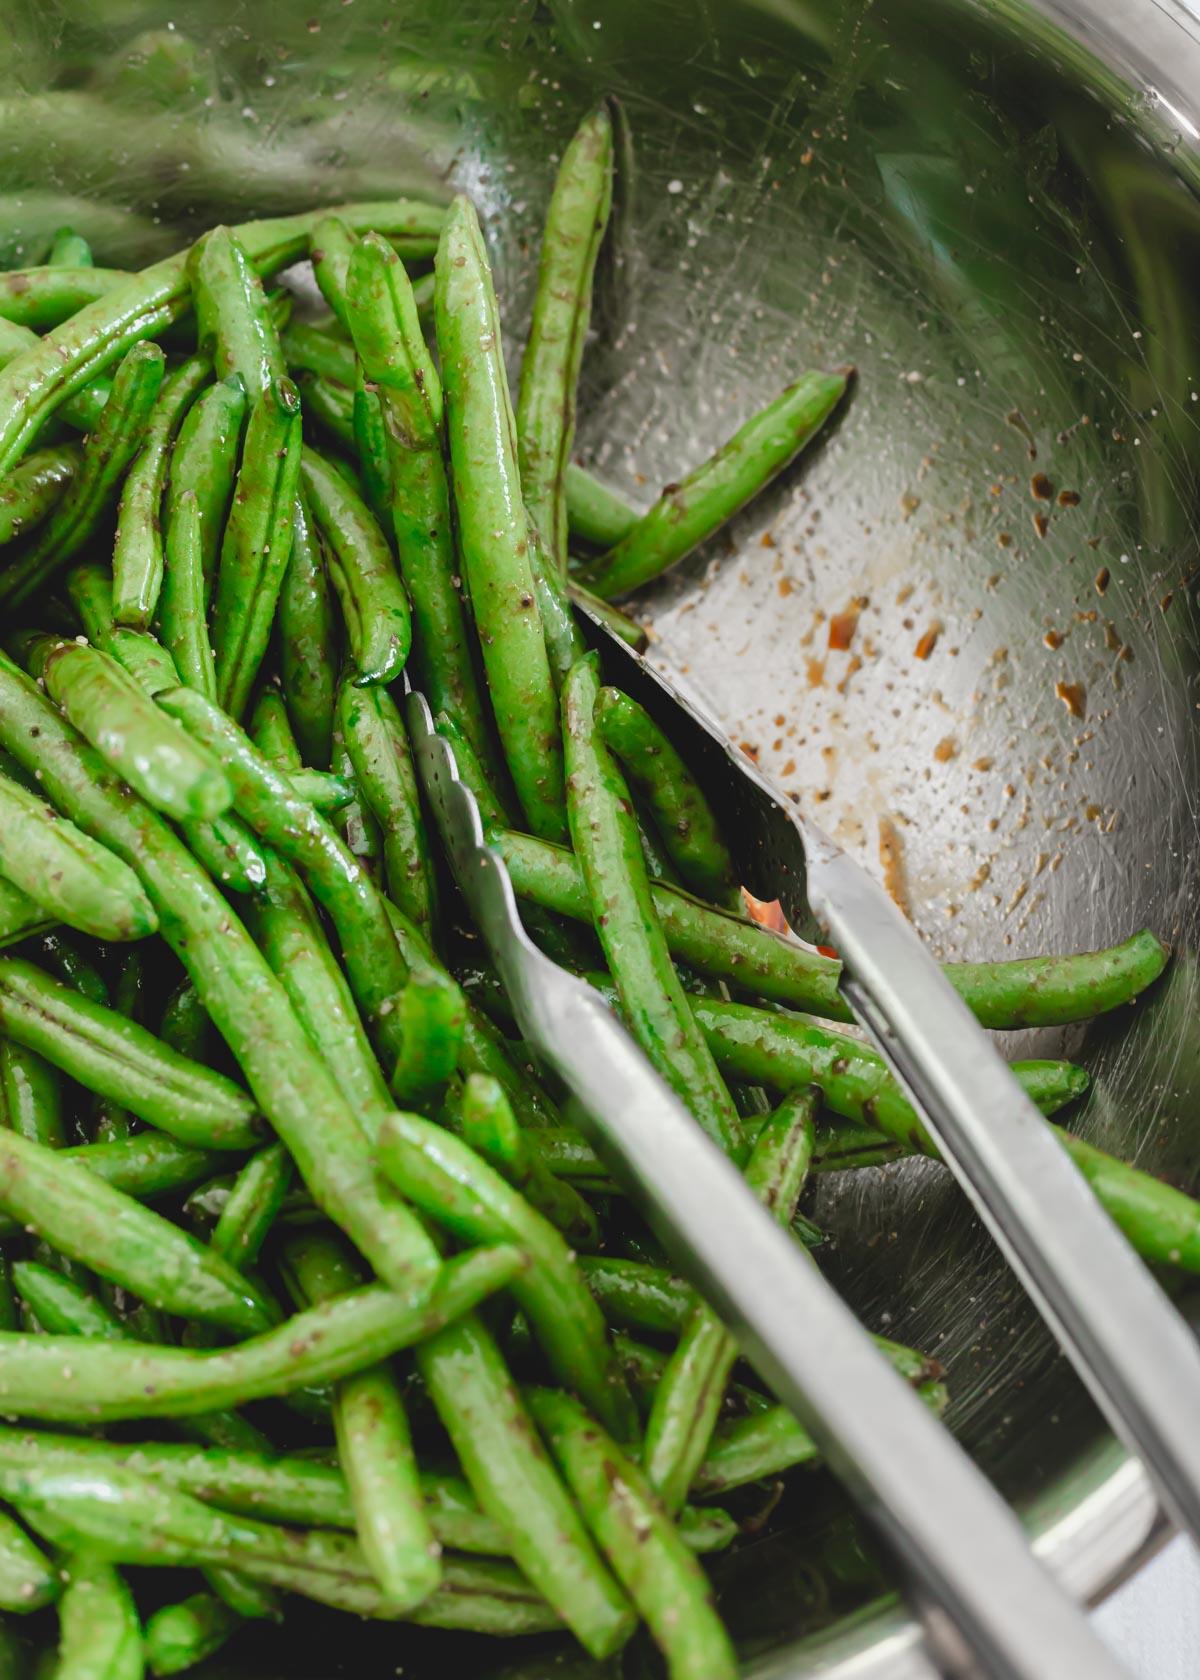 Green beans with avocado oil, tamari, garlic powder, salt and pepper in a metal bowl.